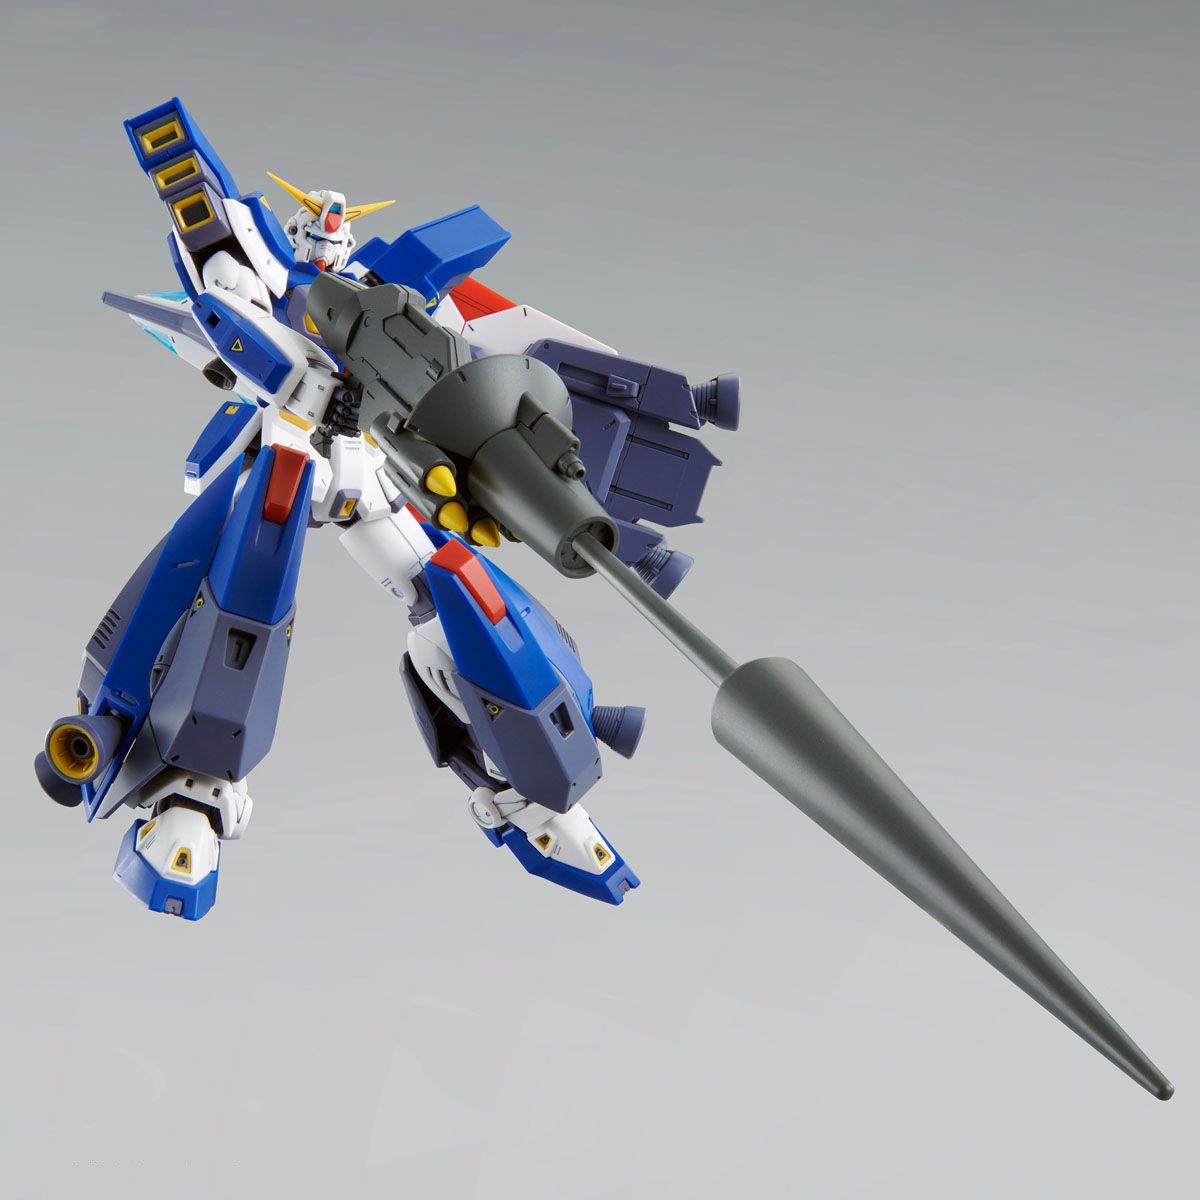 MG 1/100 MISSION PACK I-TYPE[JUPITER BATTLE Ver.] for GUNDAM F90